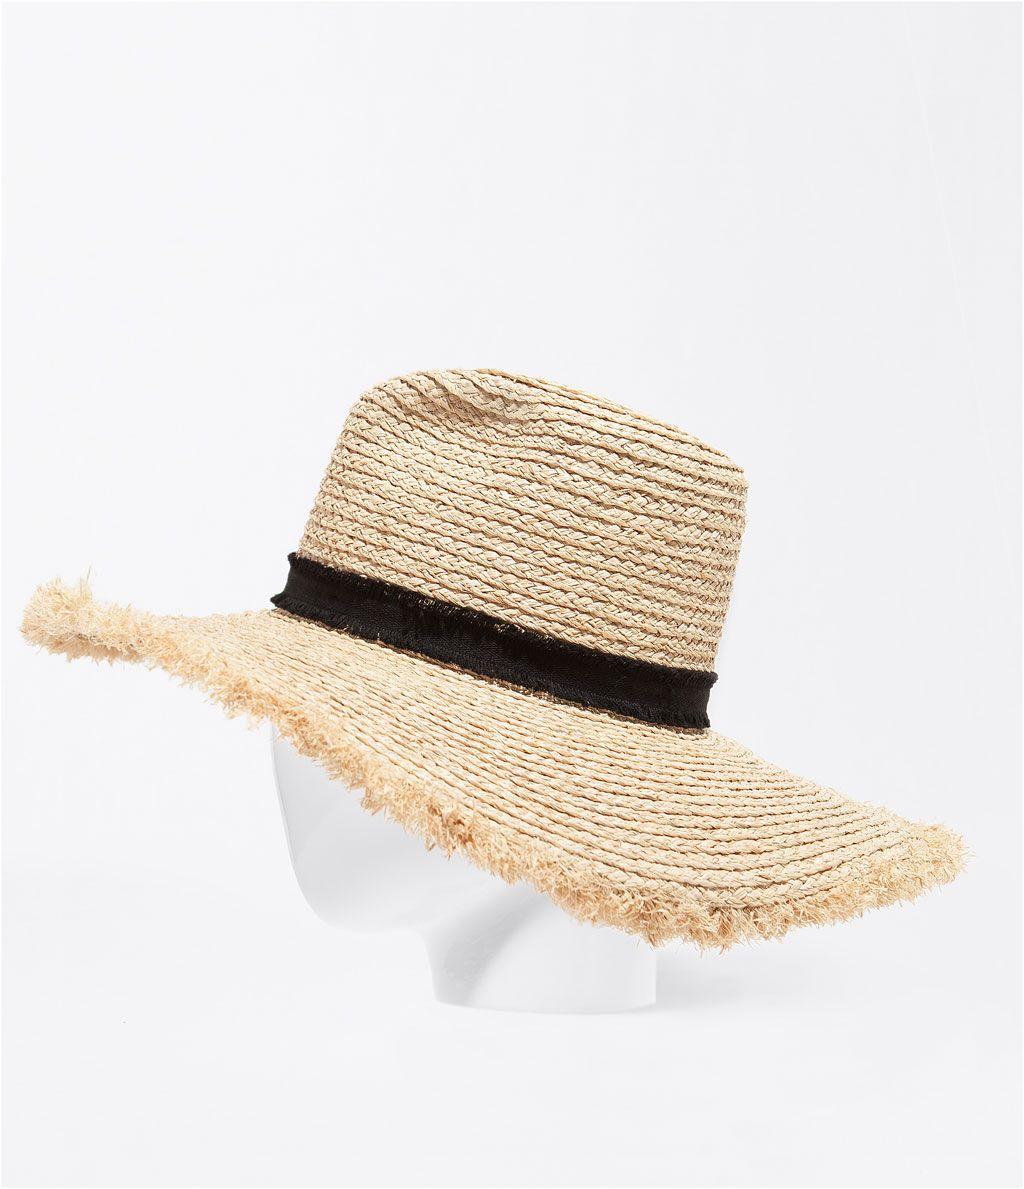 pamela  lazo  sombrero  playa  · ZARA · 17 3a0dc861352